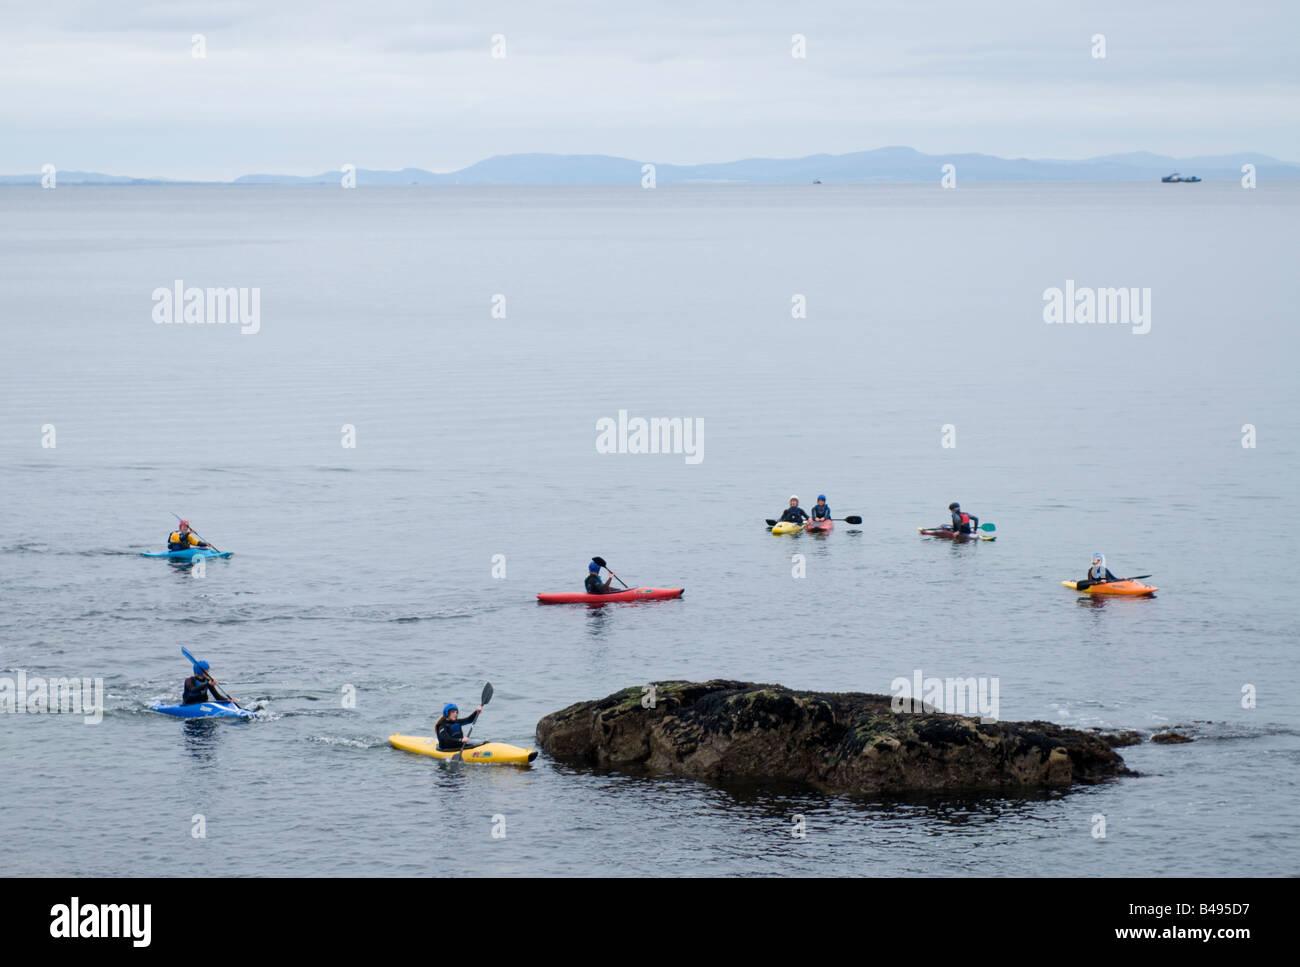 Sea Kayaking at Hopeman in the Moray Firth North East Scotland UK - Stock Image